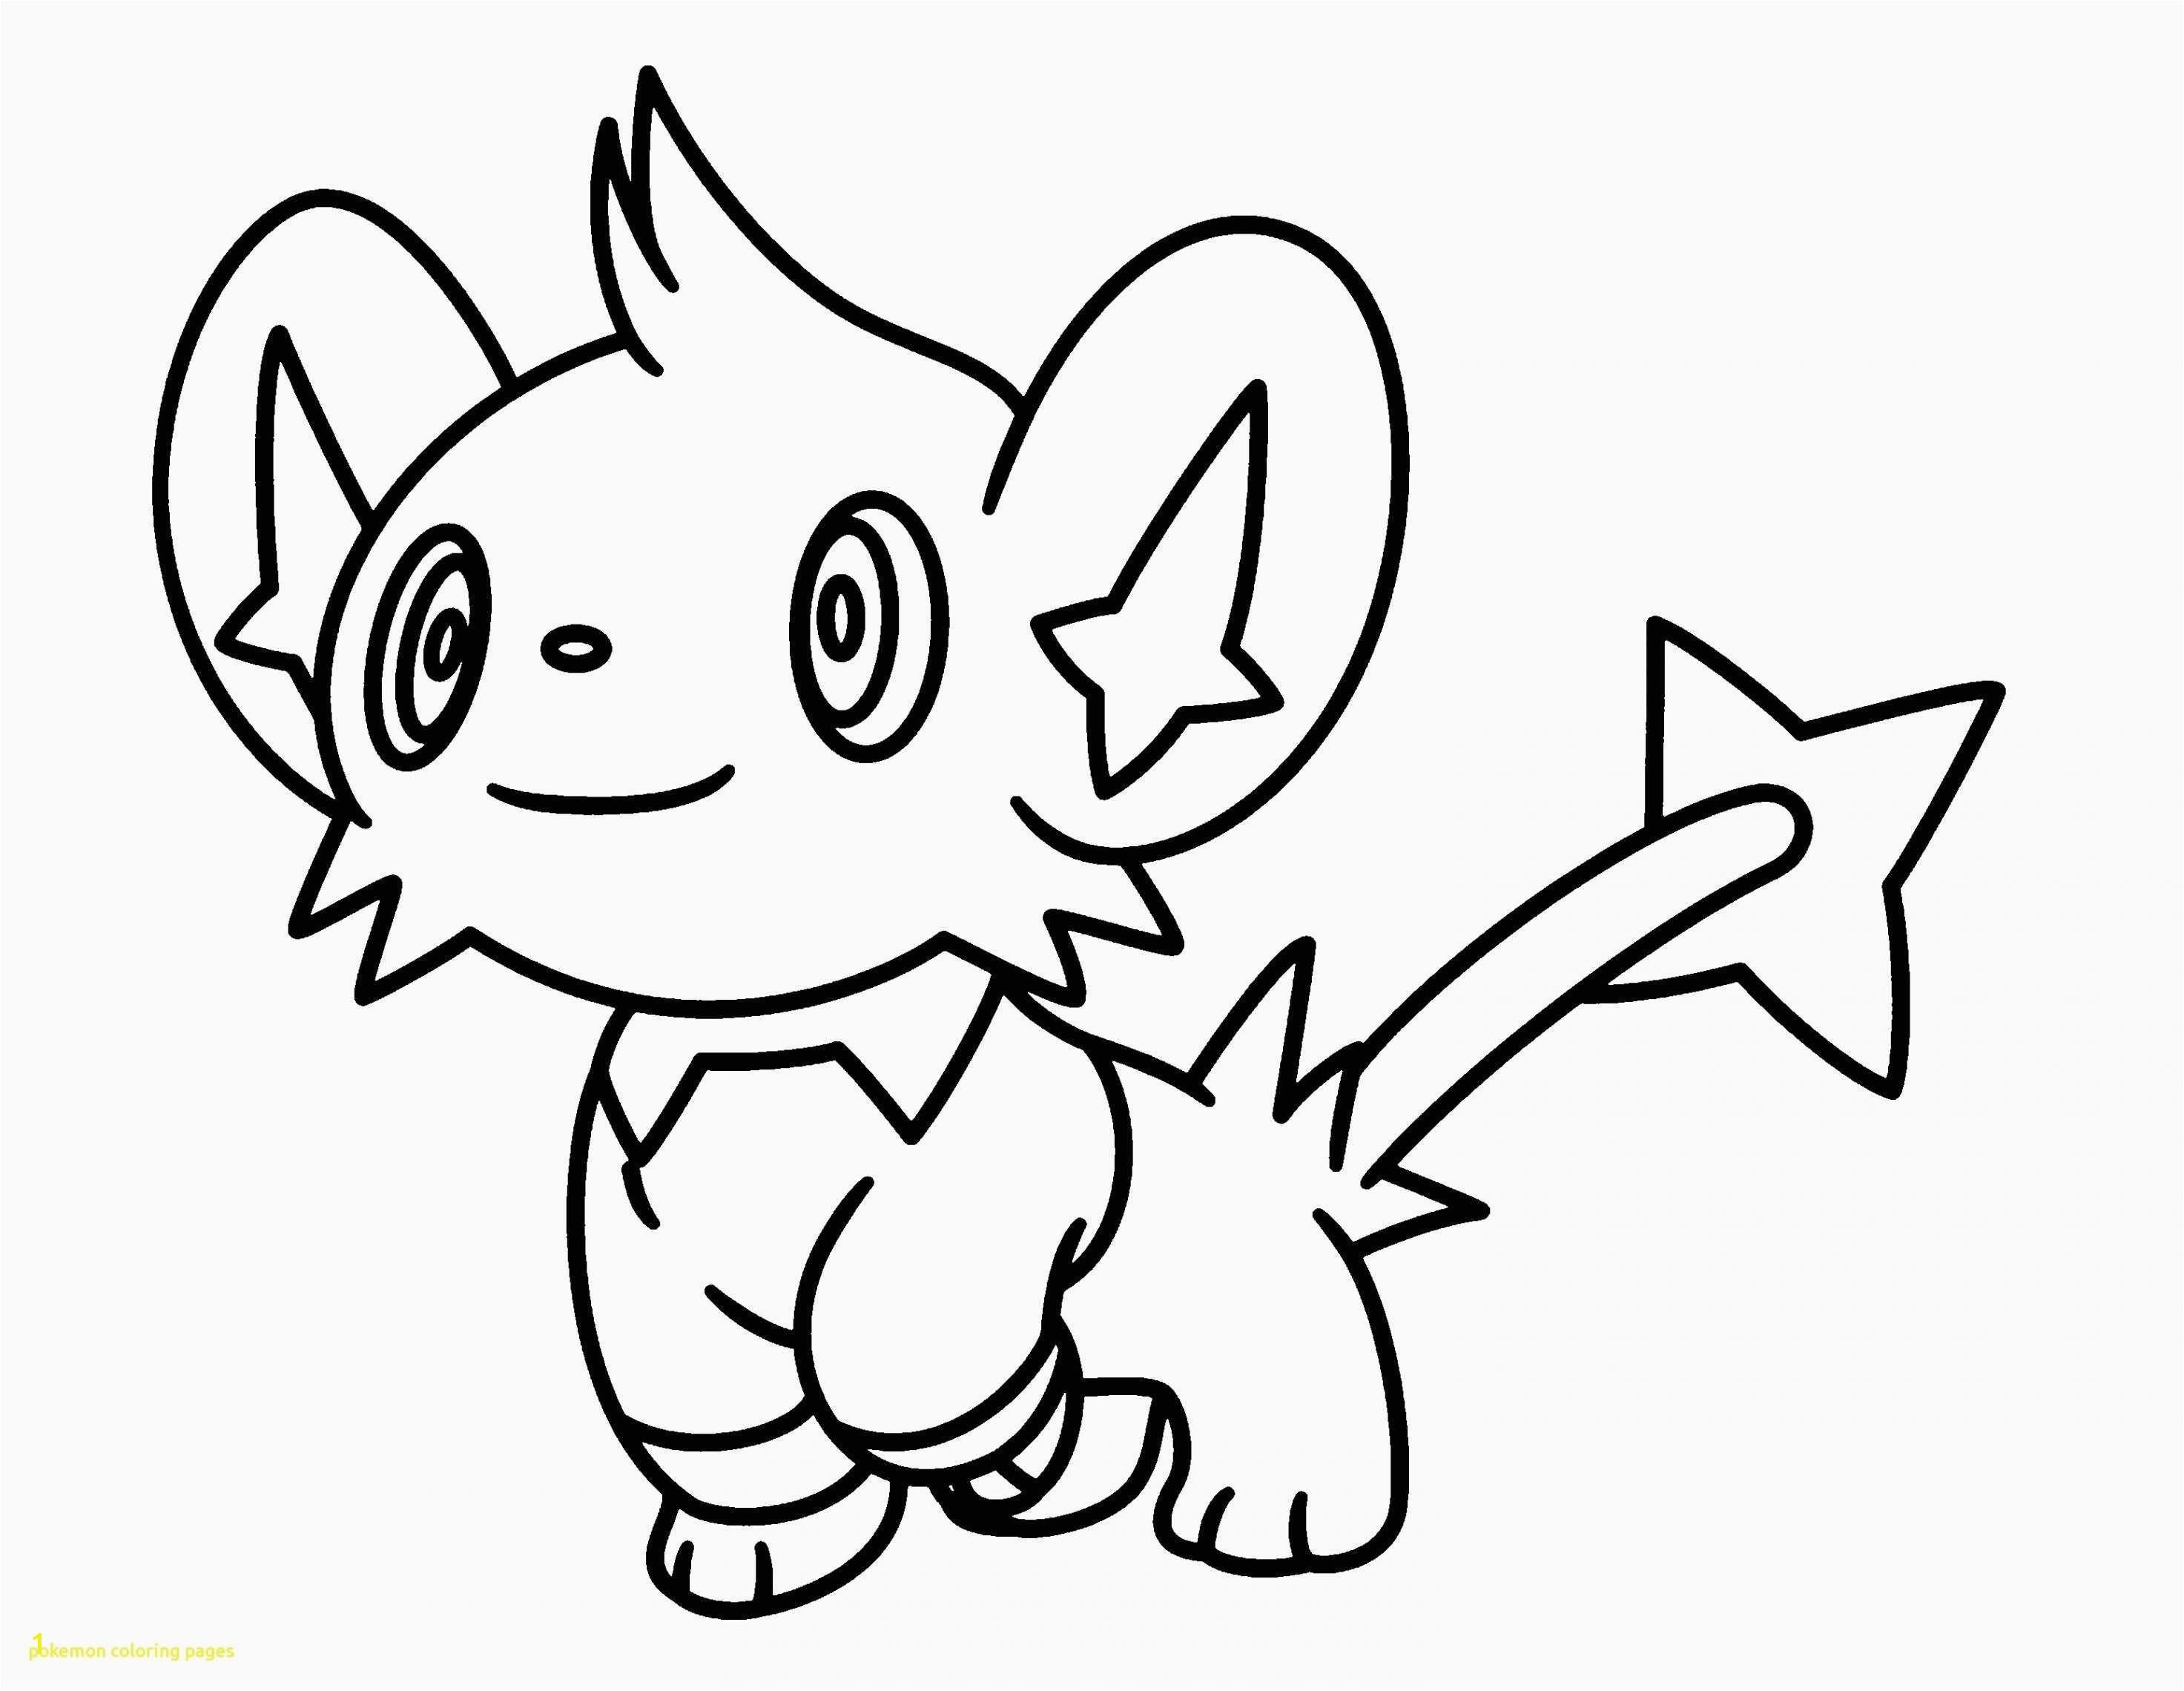 Boy Coloring Pages to Print Printable Pokemon Coloring Pages Free Beautiful Coloring Printables 0d – Fun